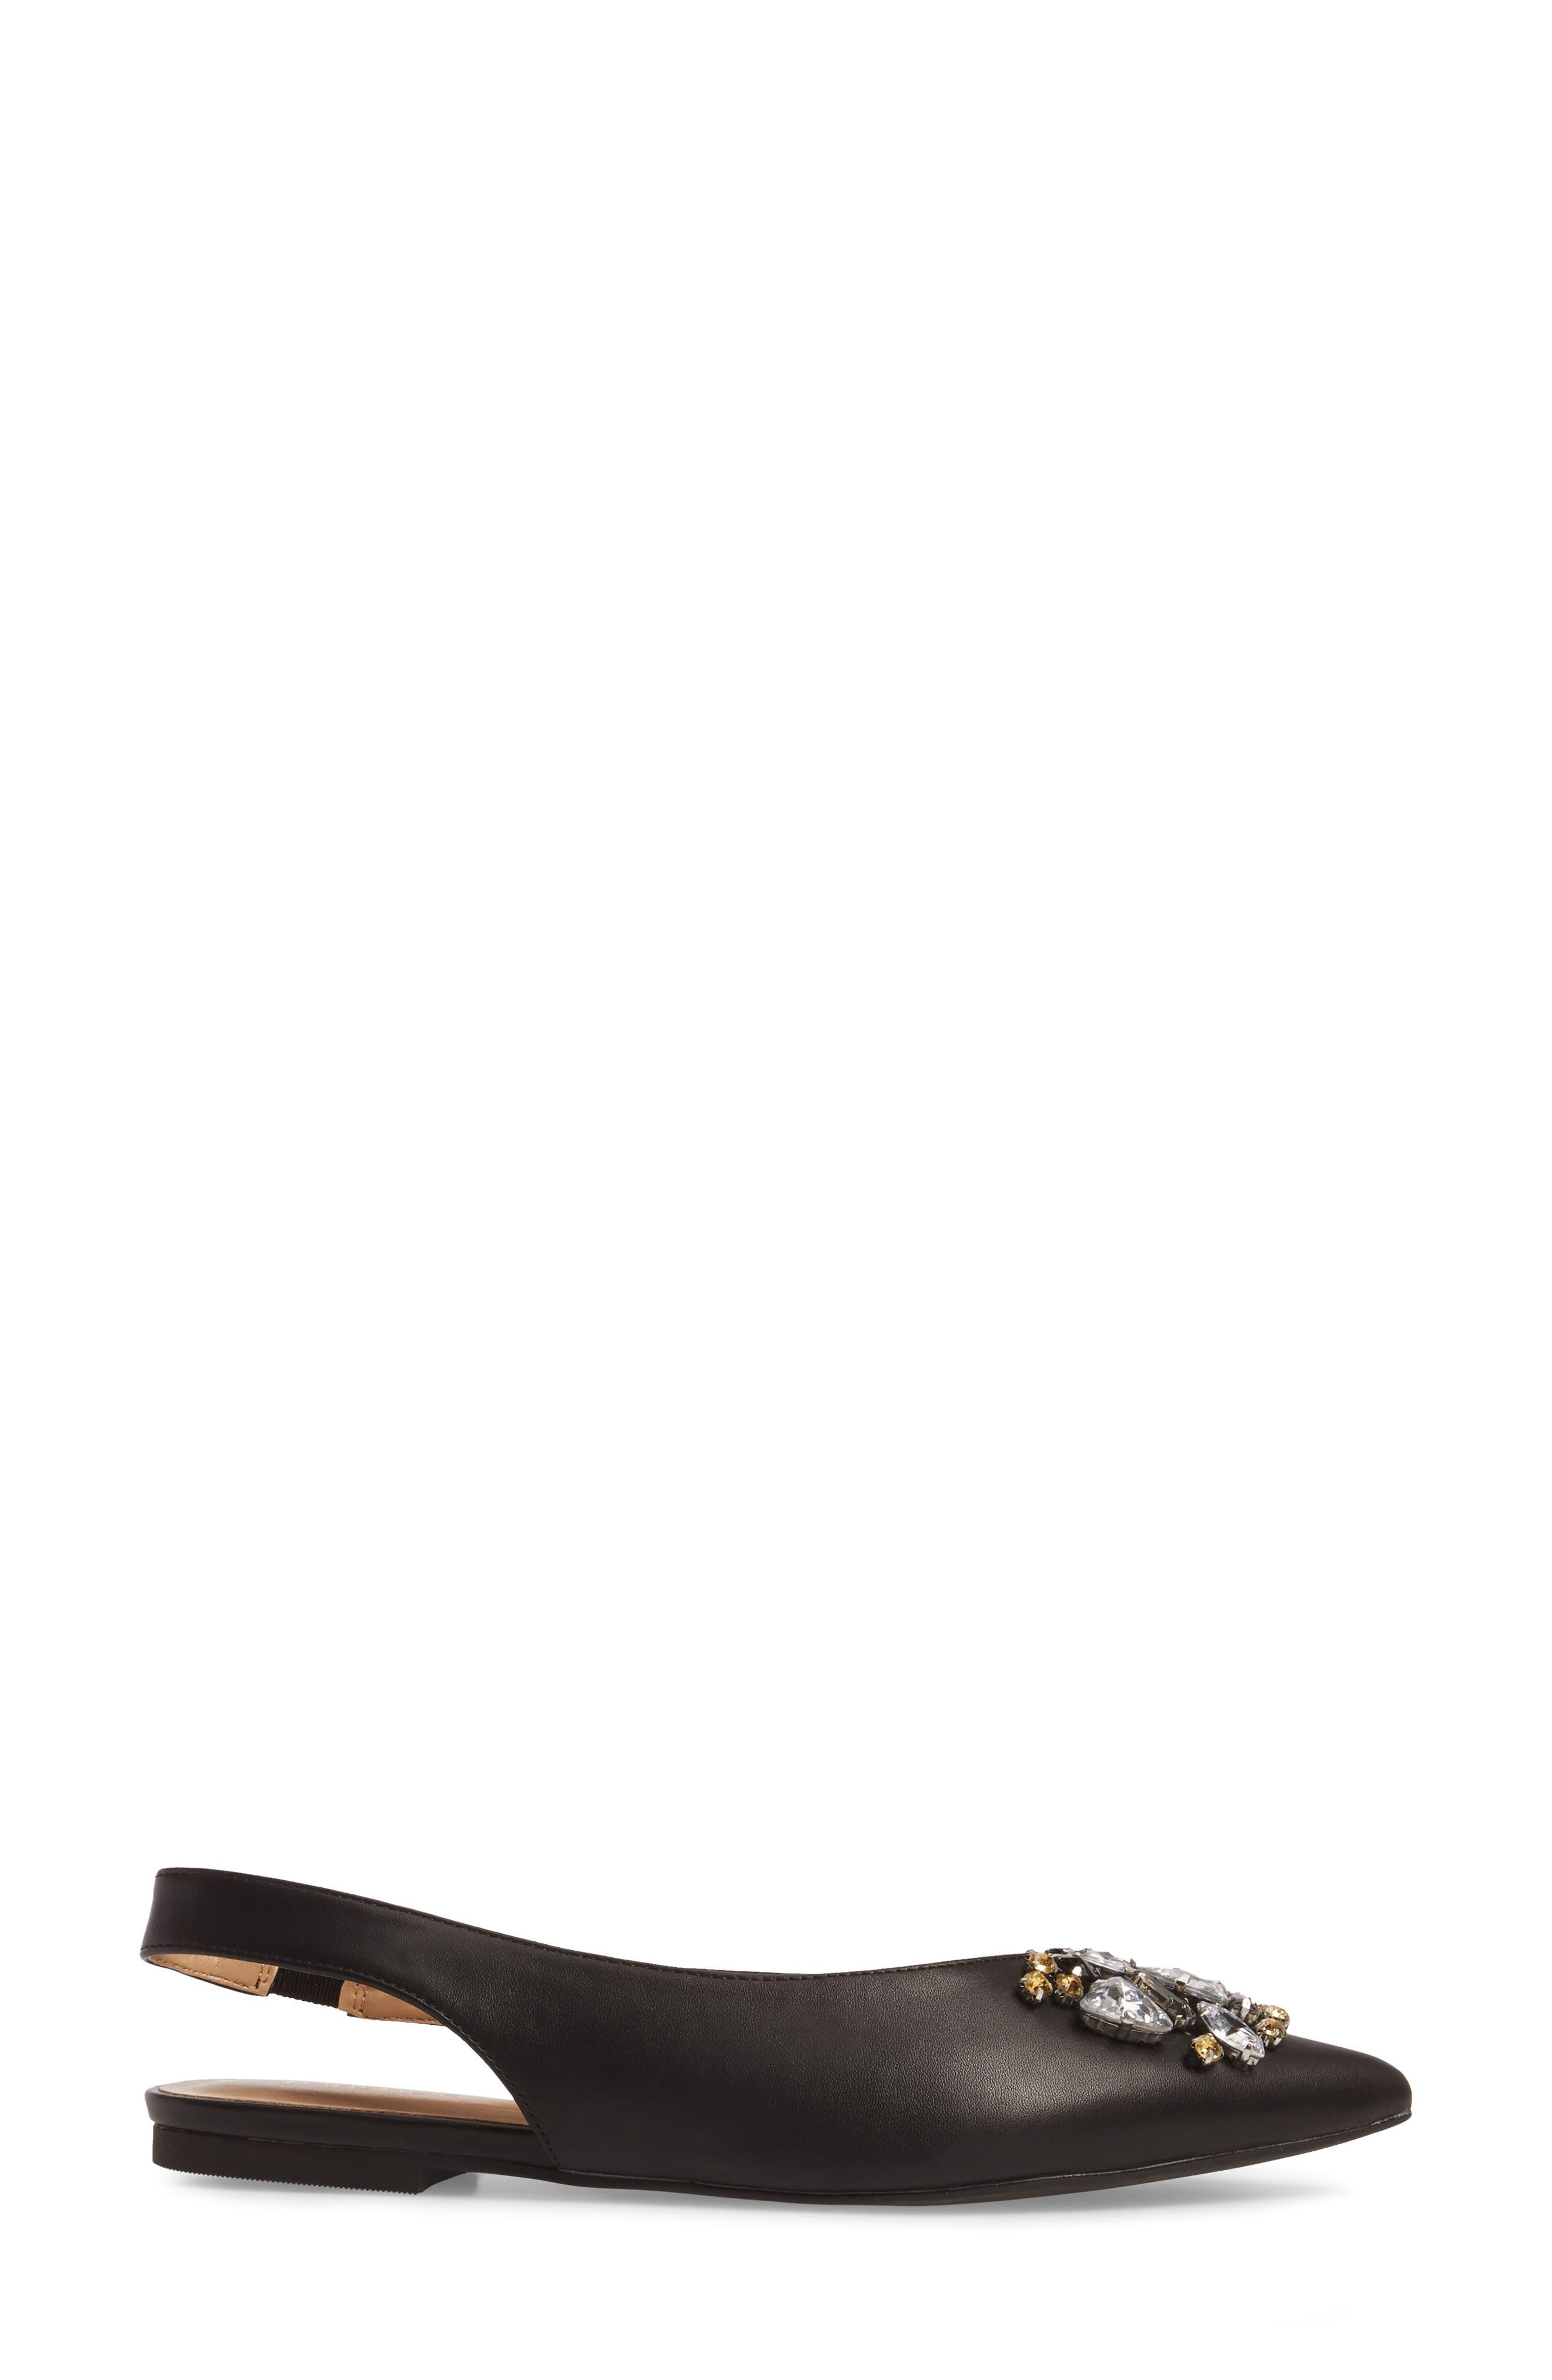 Alternate Image 3  - Topshop Ava Embellished Slingback Flat (Women)